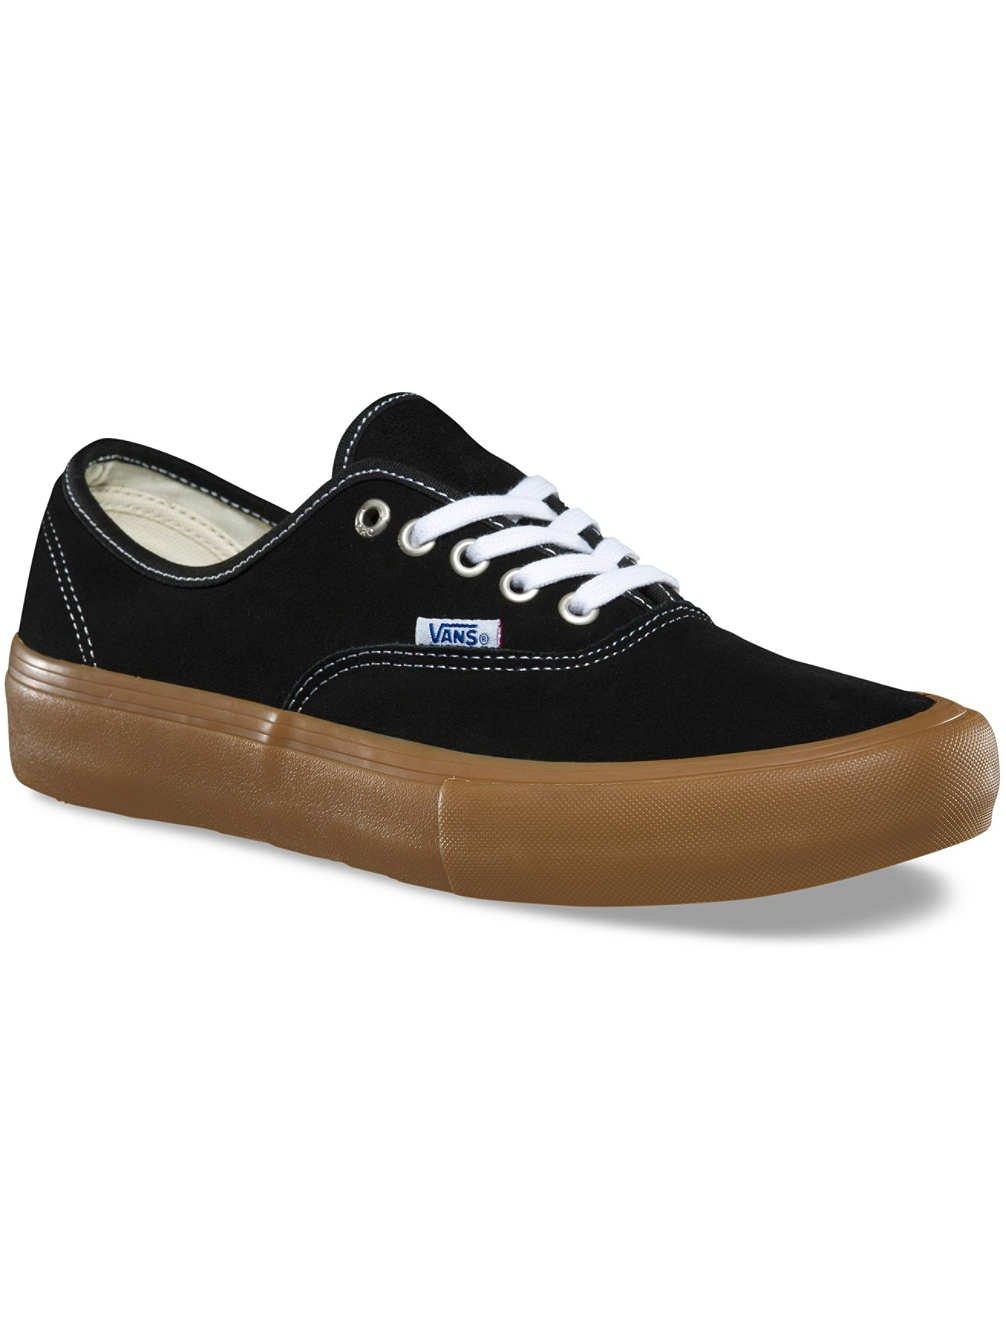 Vans AUTHENTIC, Unisex-Erwachsene Unisex-Erwachsene AUTHENTIC, Sneakers schwarz/light gum f9eb25